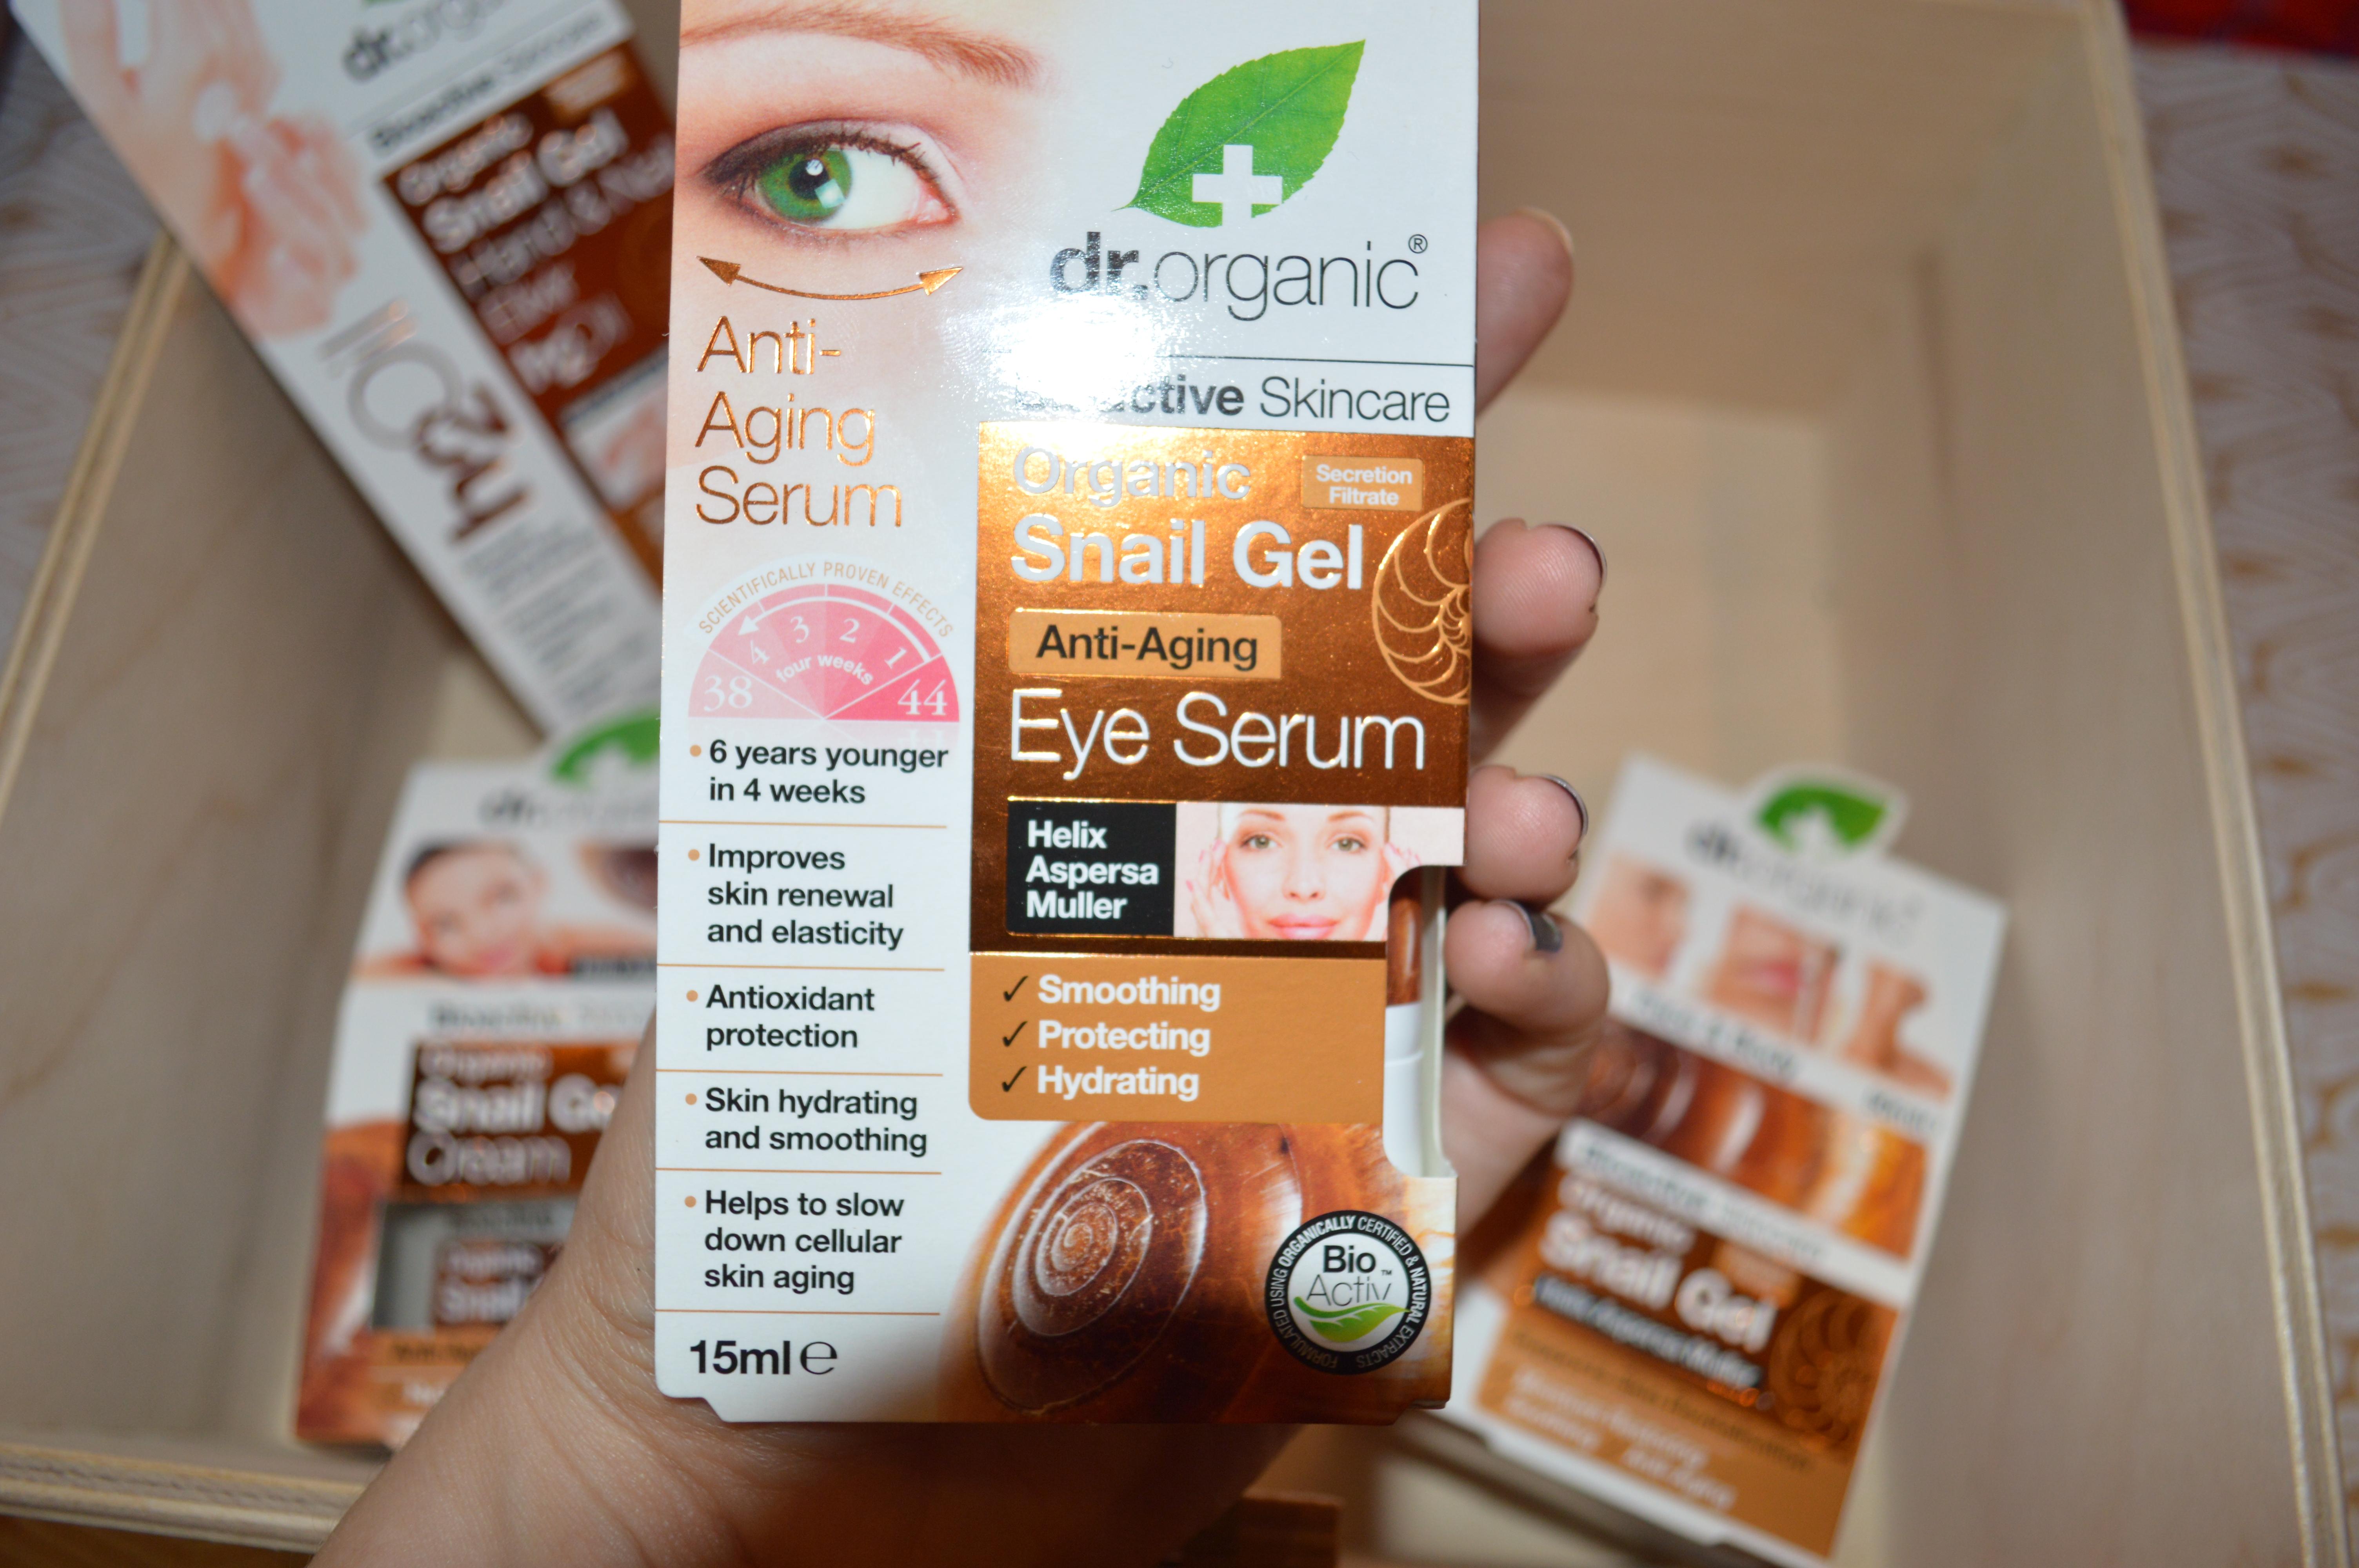 Dr. Organic Skincare Secret Revealed - Product: Snail Gel Eye Serum